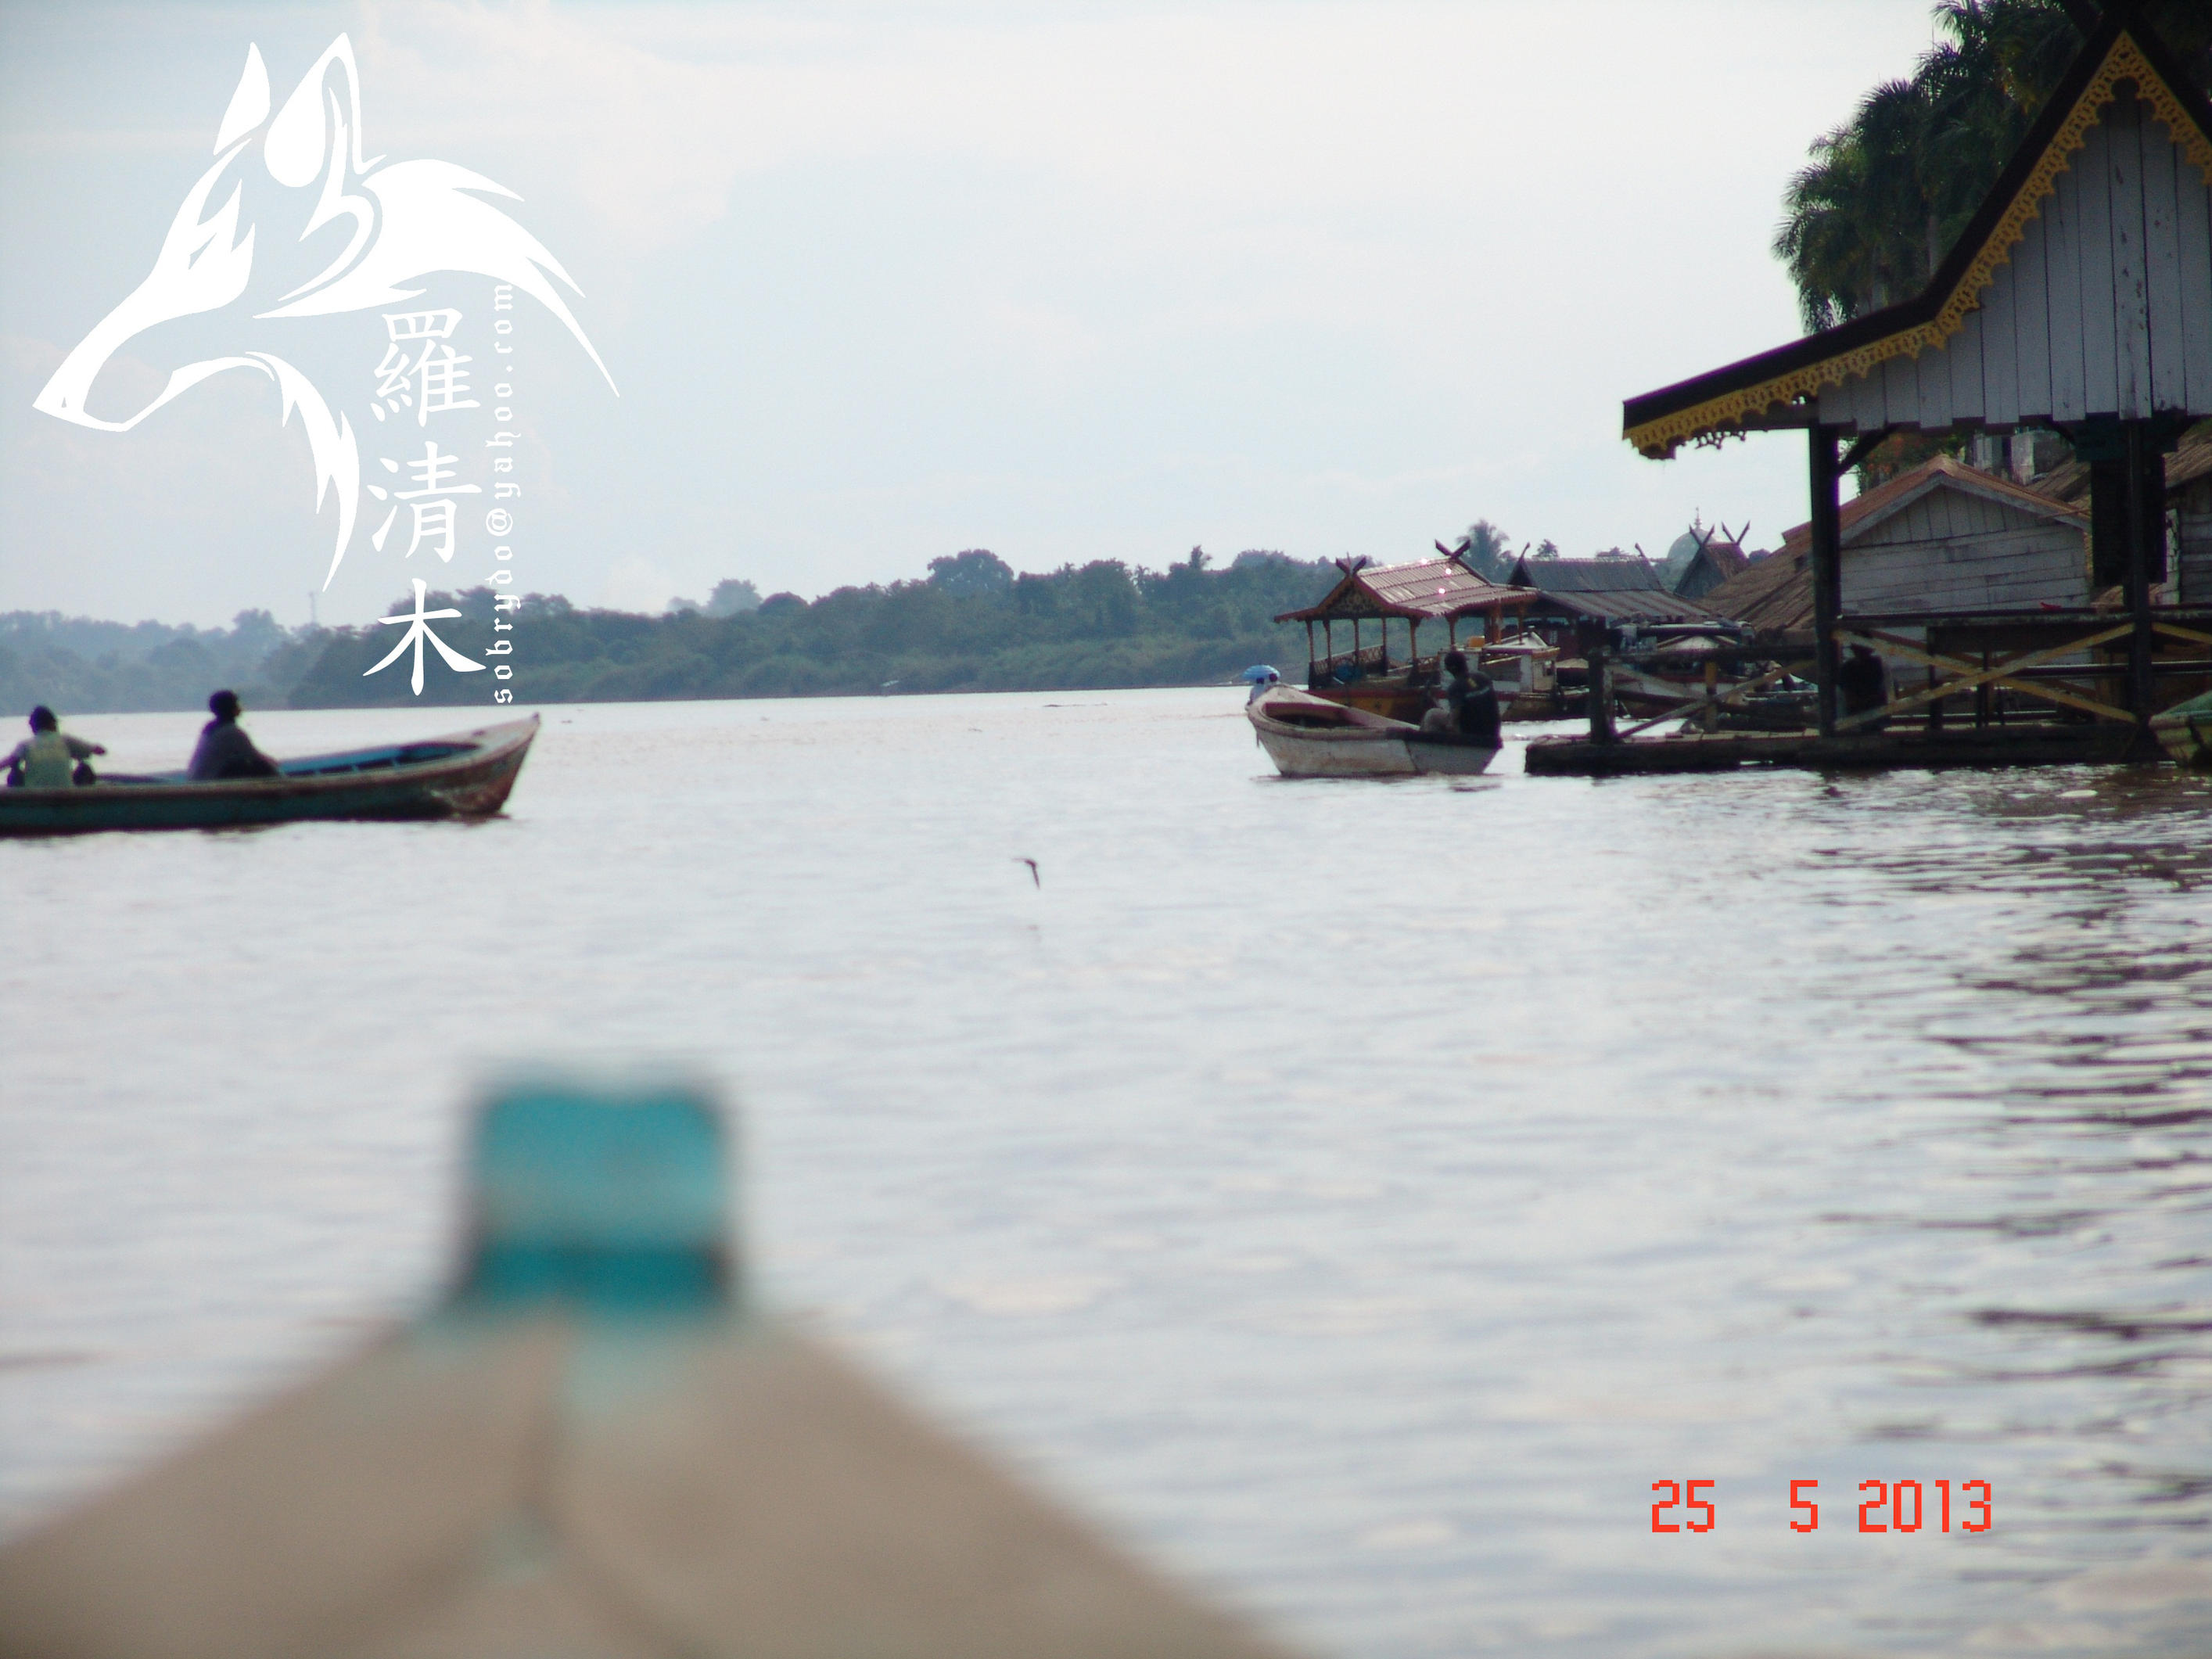 Batang Hari Jambi - River Side by sobrydo